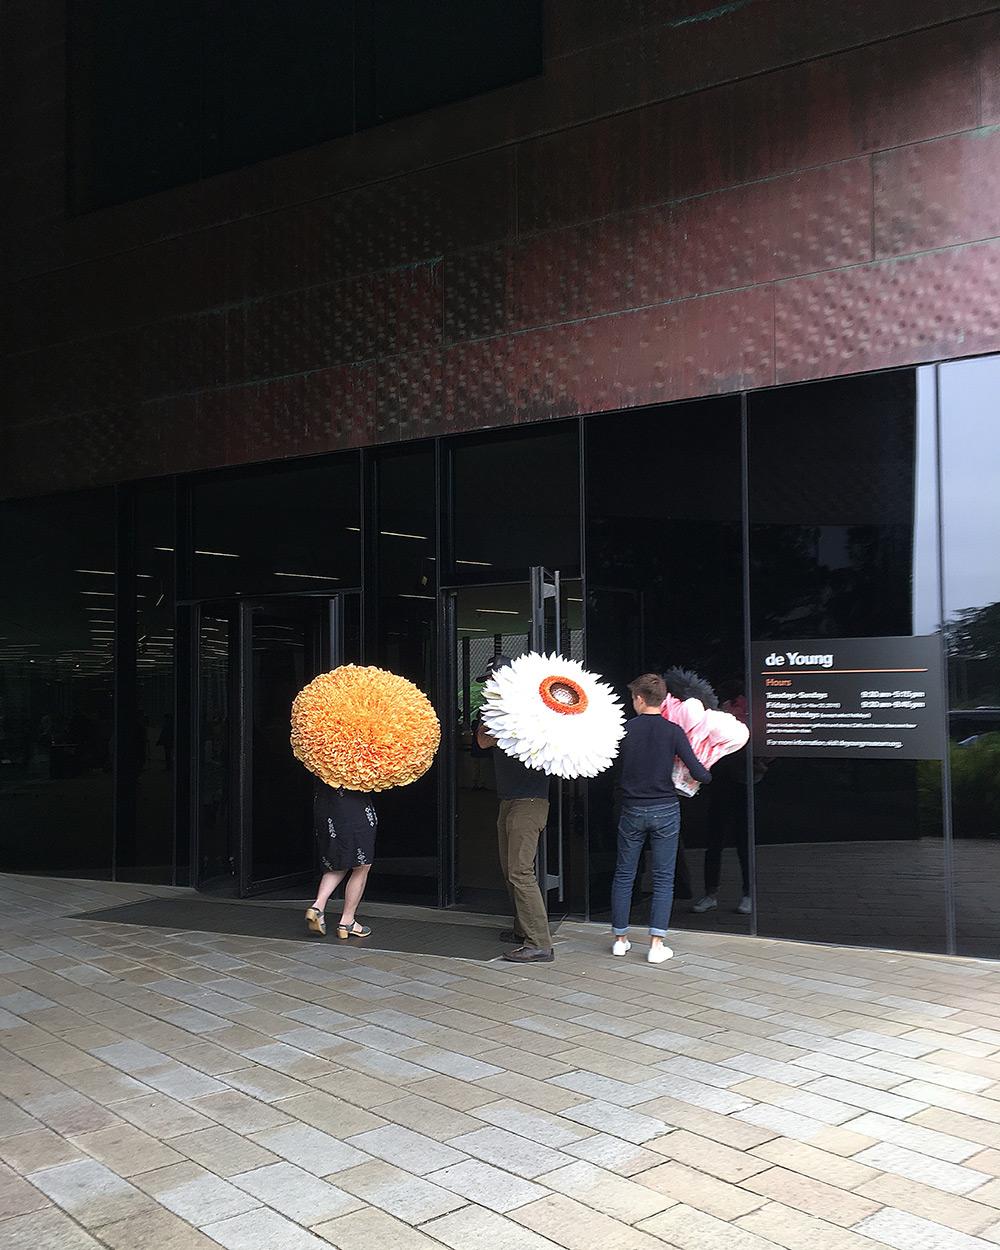 esculturas-gigantes-de-flores-e-400-horas-para-fazer-blog-usenatureza